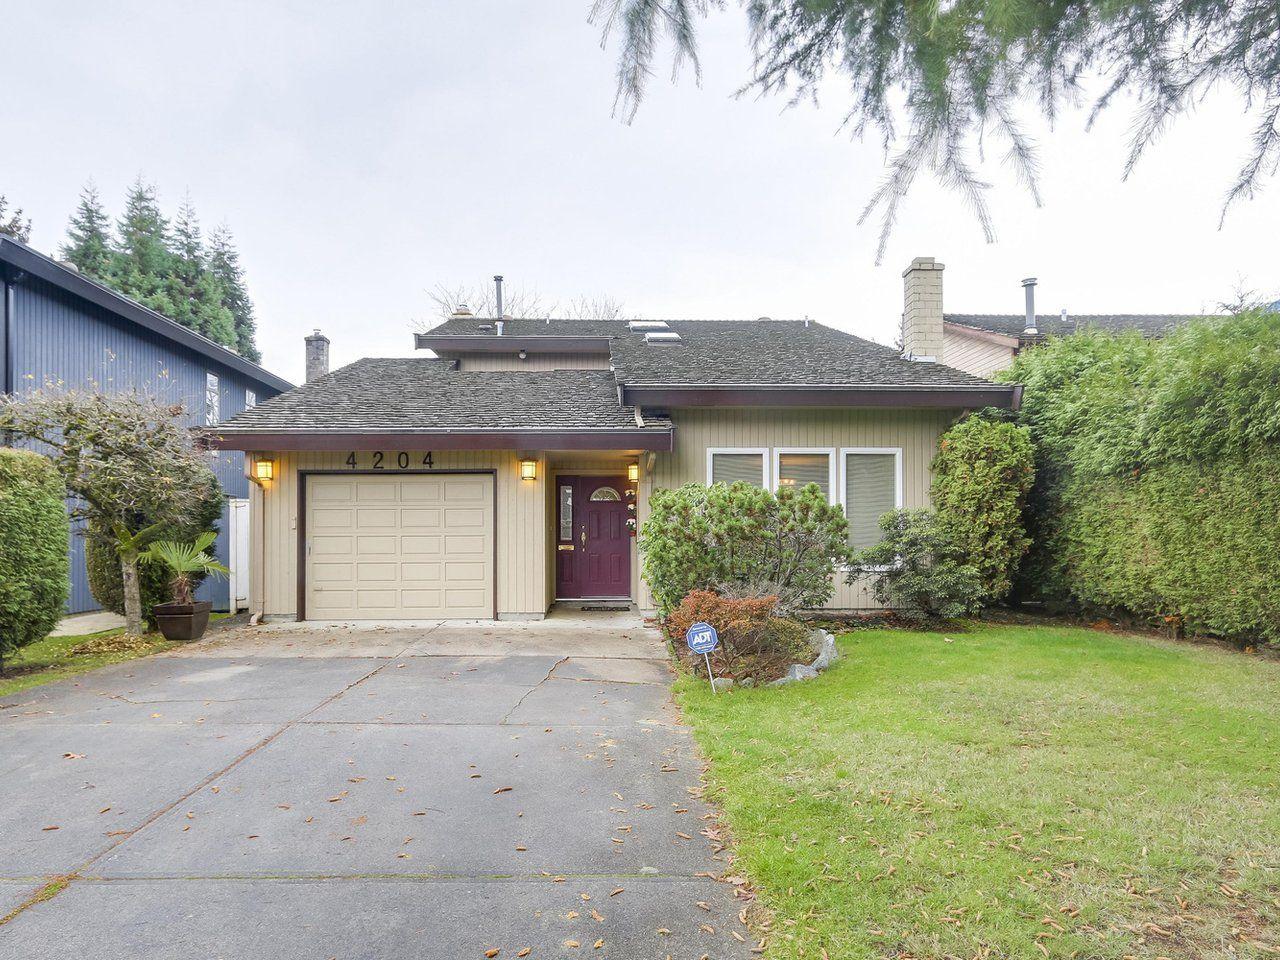 Main Photo: 4204 CRAIGFLOWER Drive in Richmond: Boyd Park House for sale : MLS®# R2224042